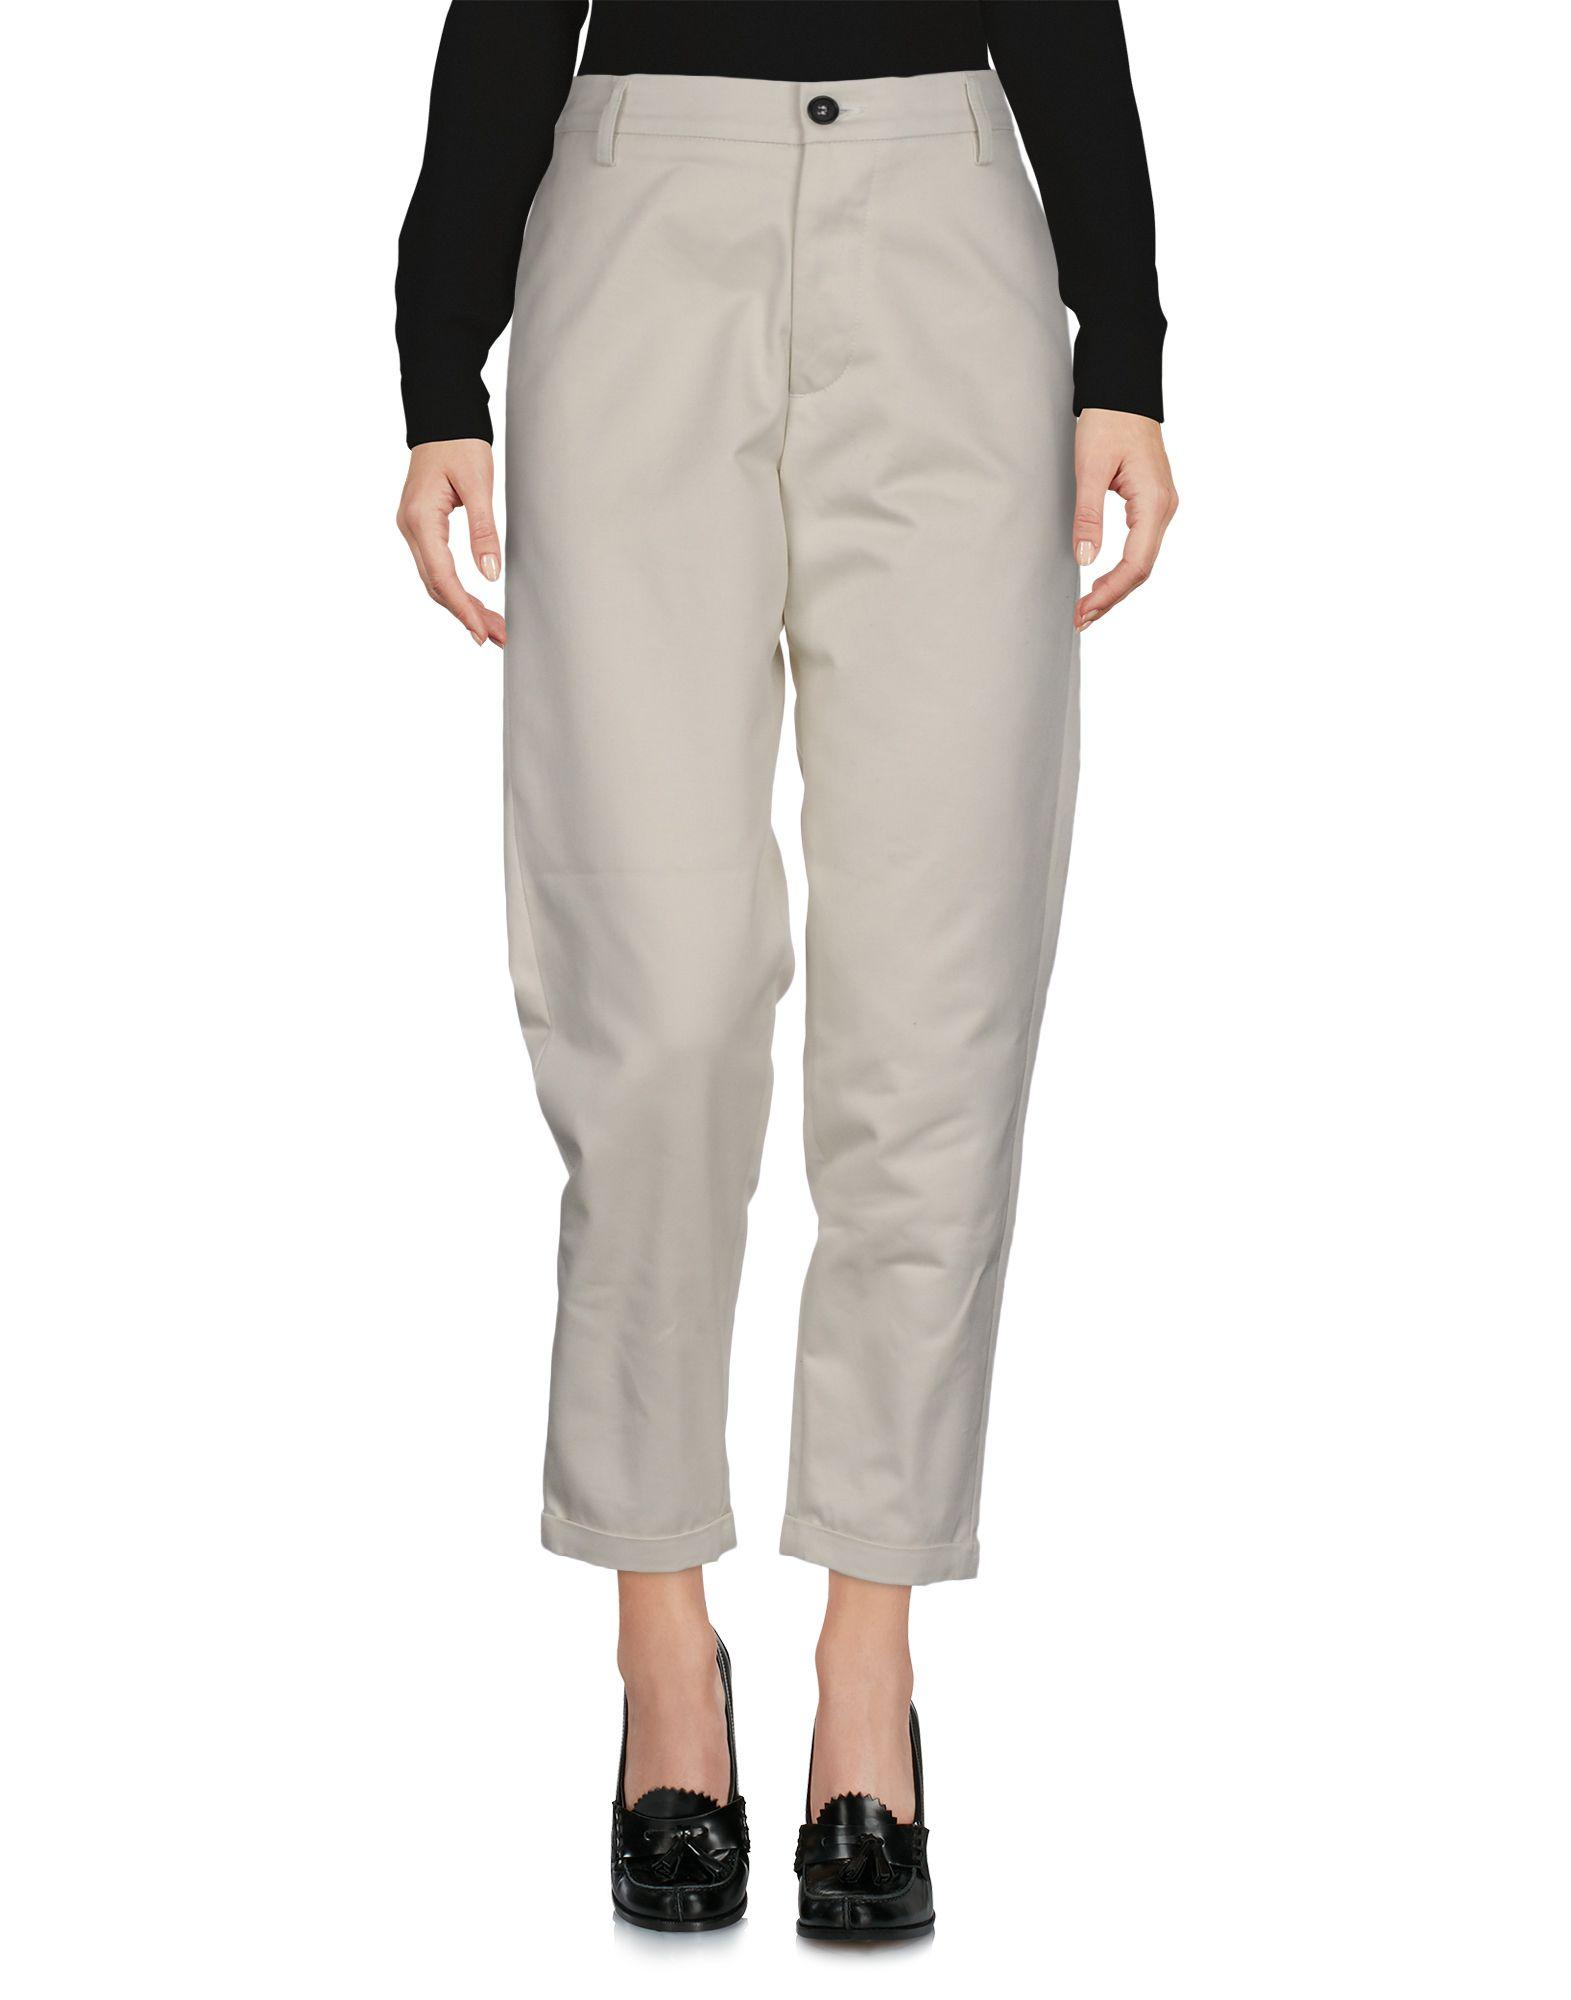 Barena Venezia Casual Pants In Ivory